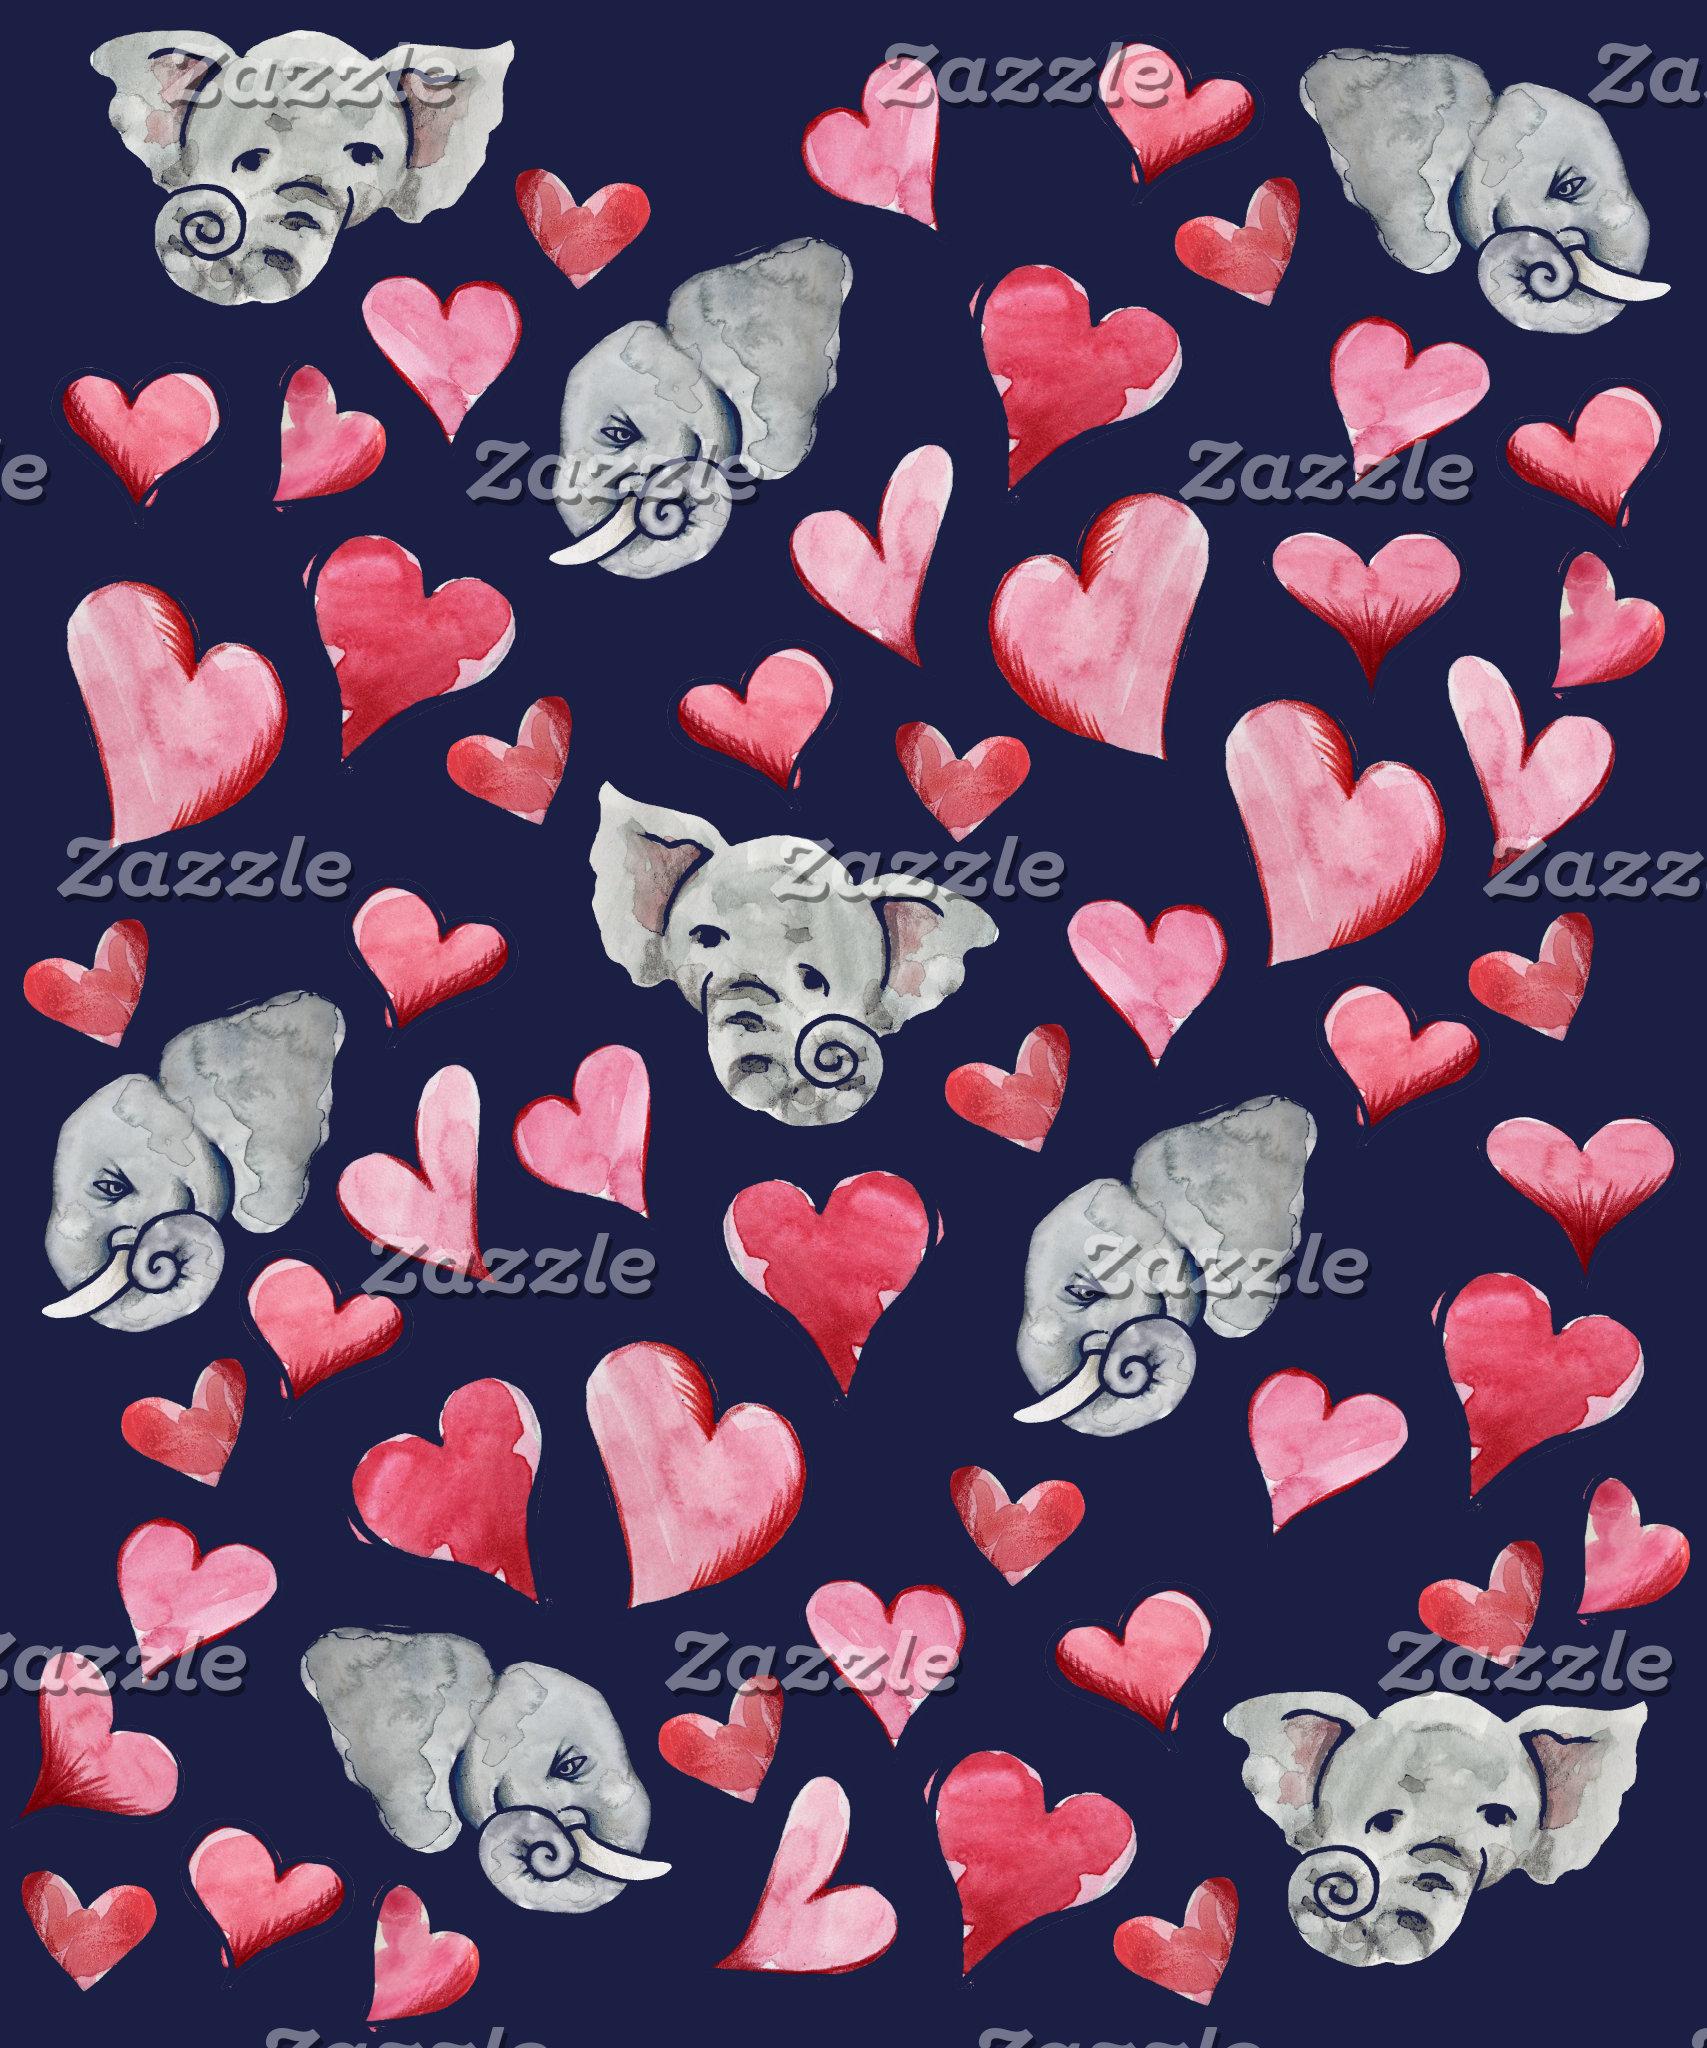 Elephant lover